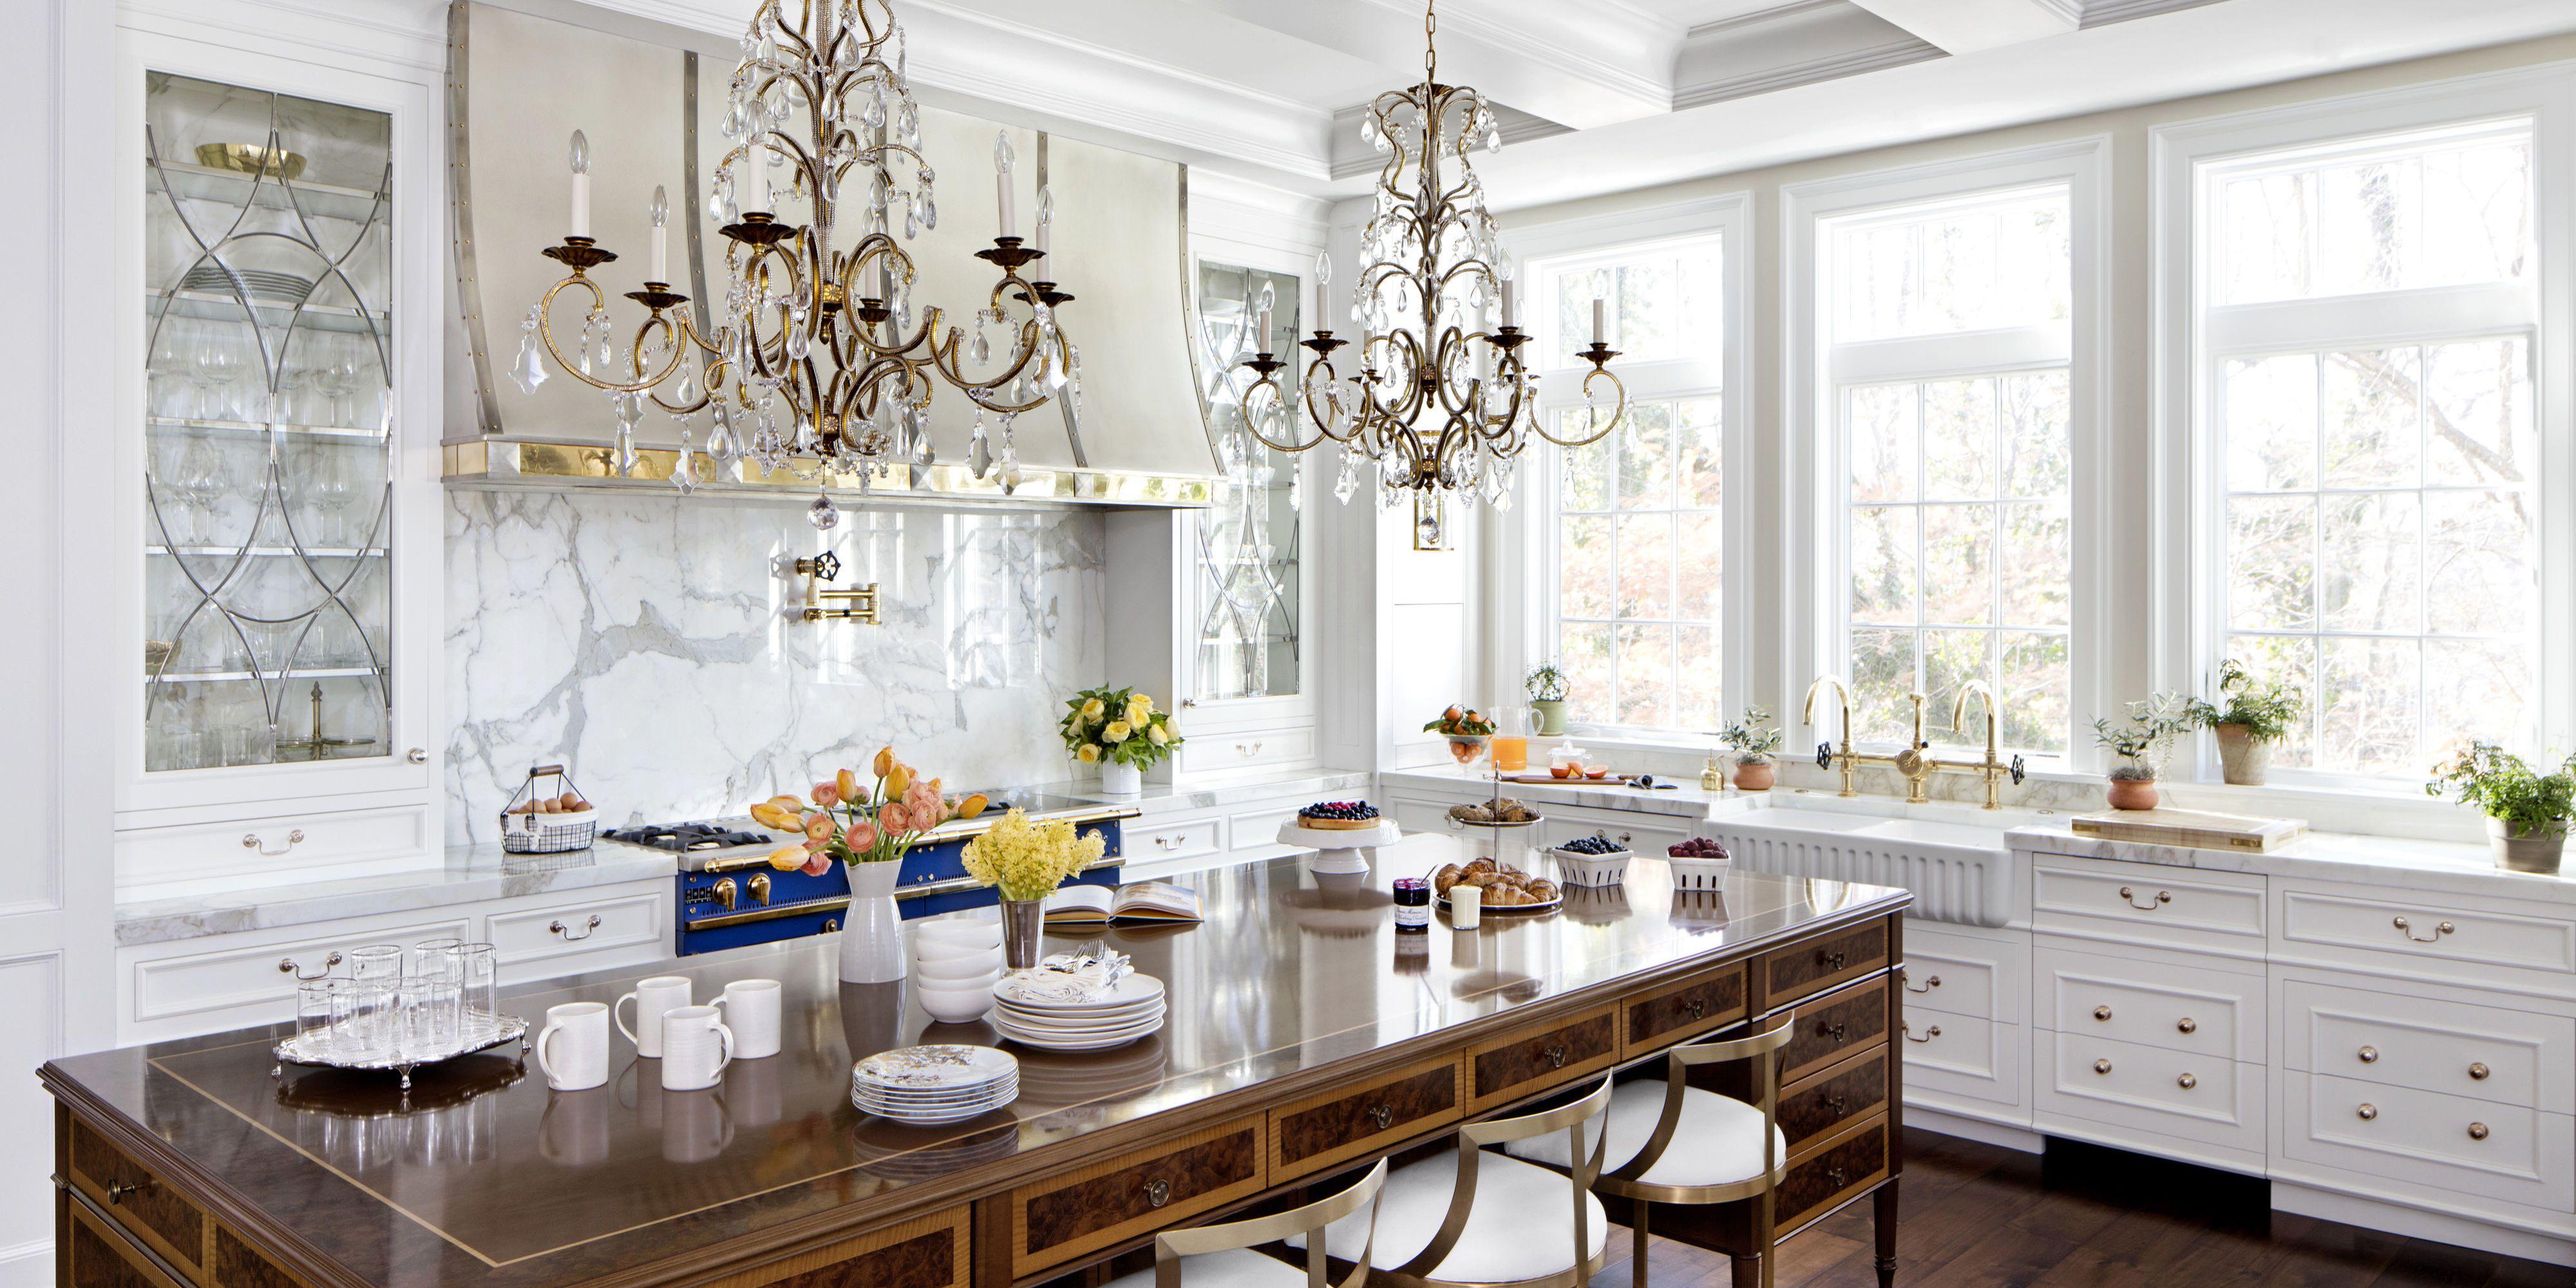 white kitchen cabinets formal white kitchen QQCEUMU